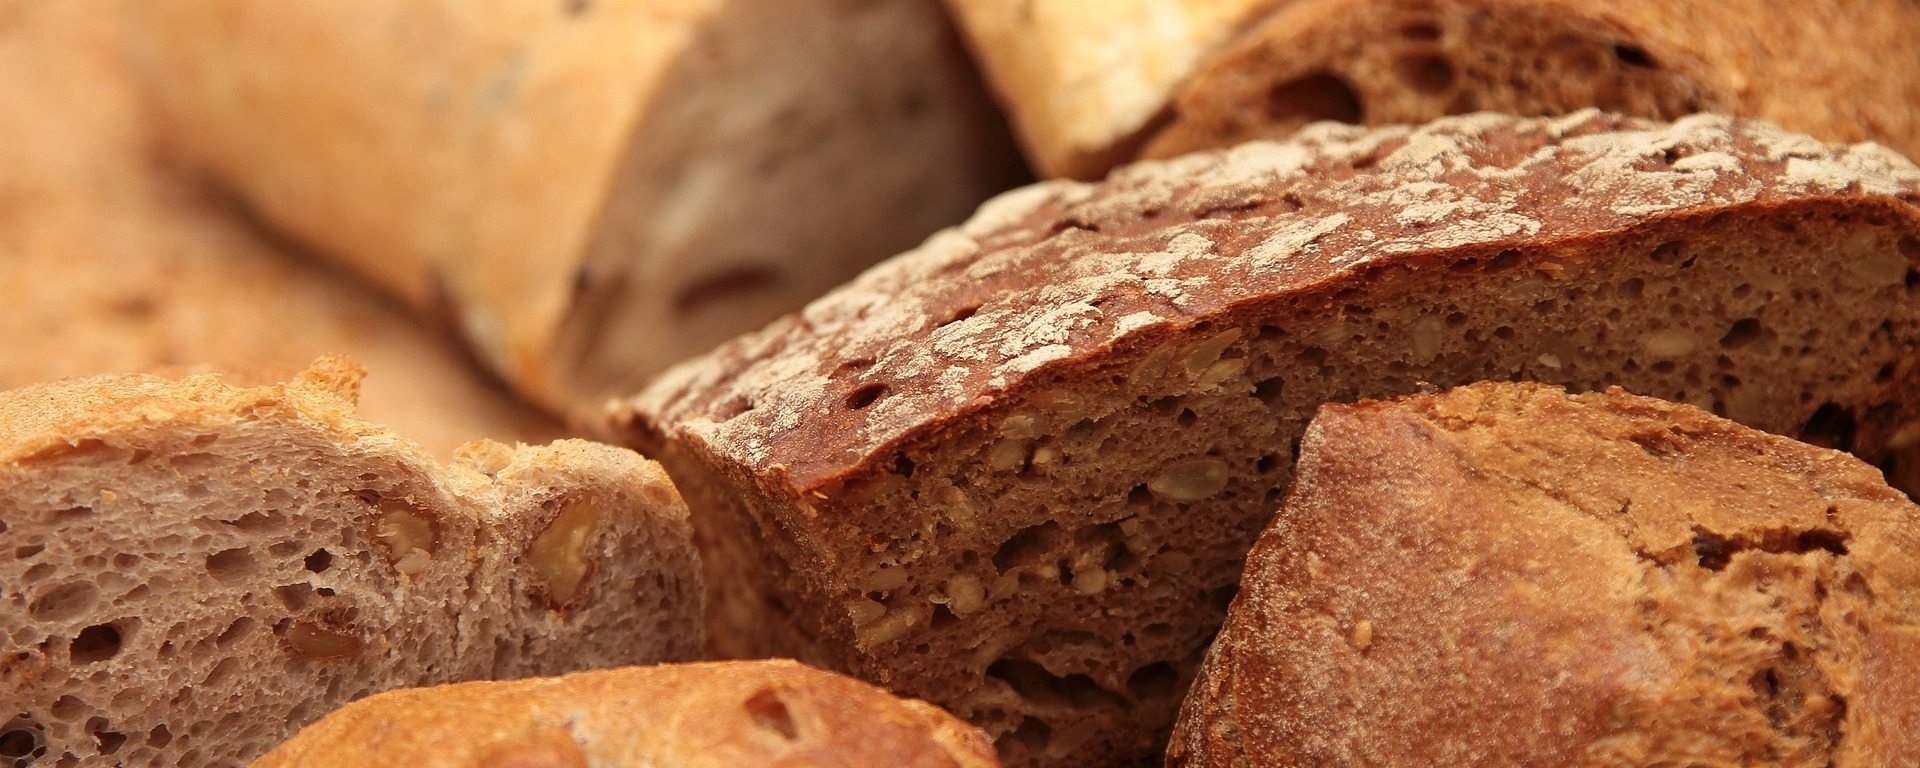 bread,roll,eat,food,breakfast,baked goods,grains,fresh,breads,DON CHARISMA